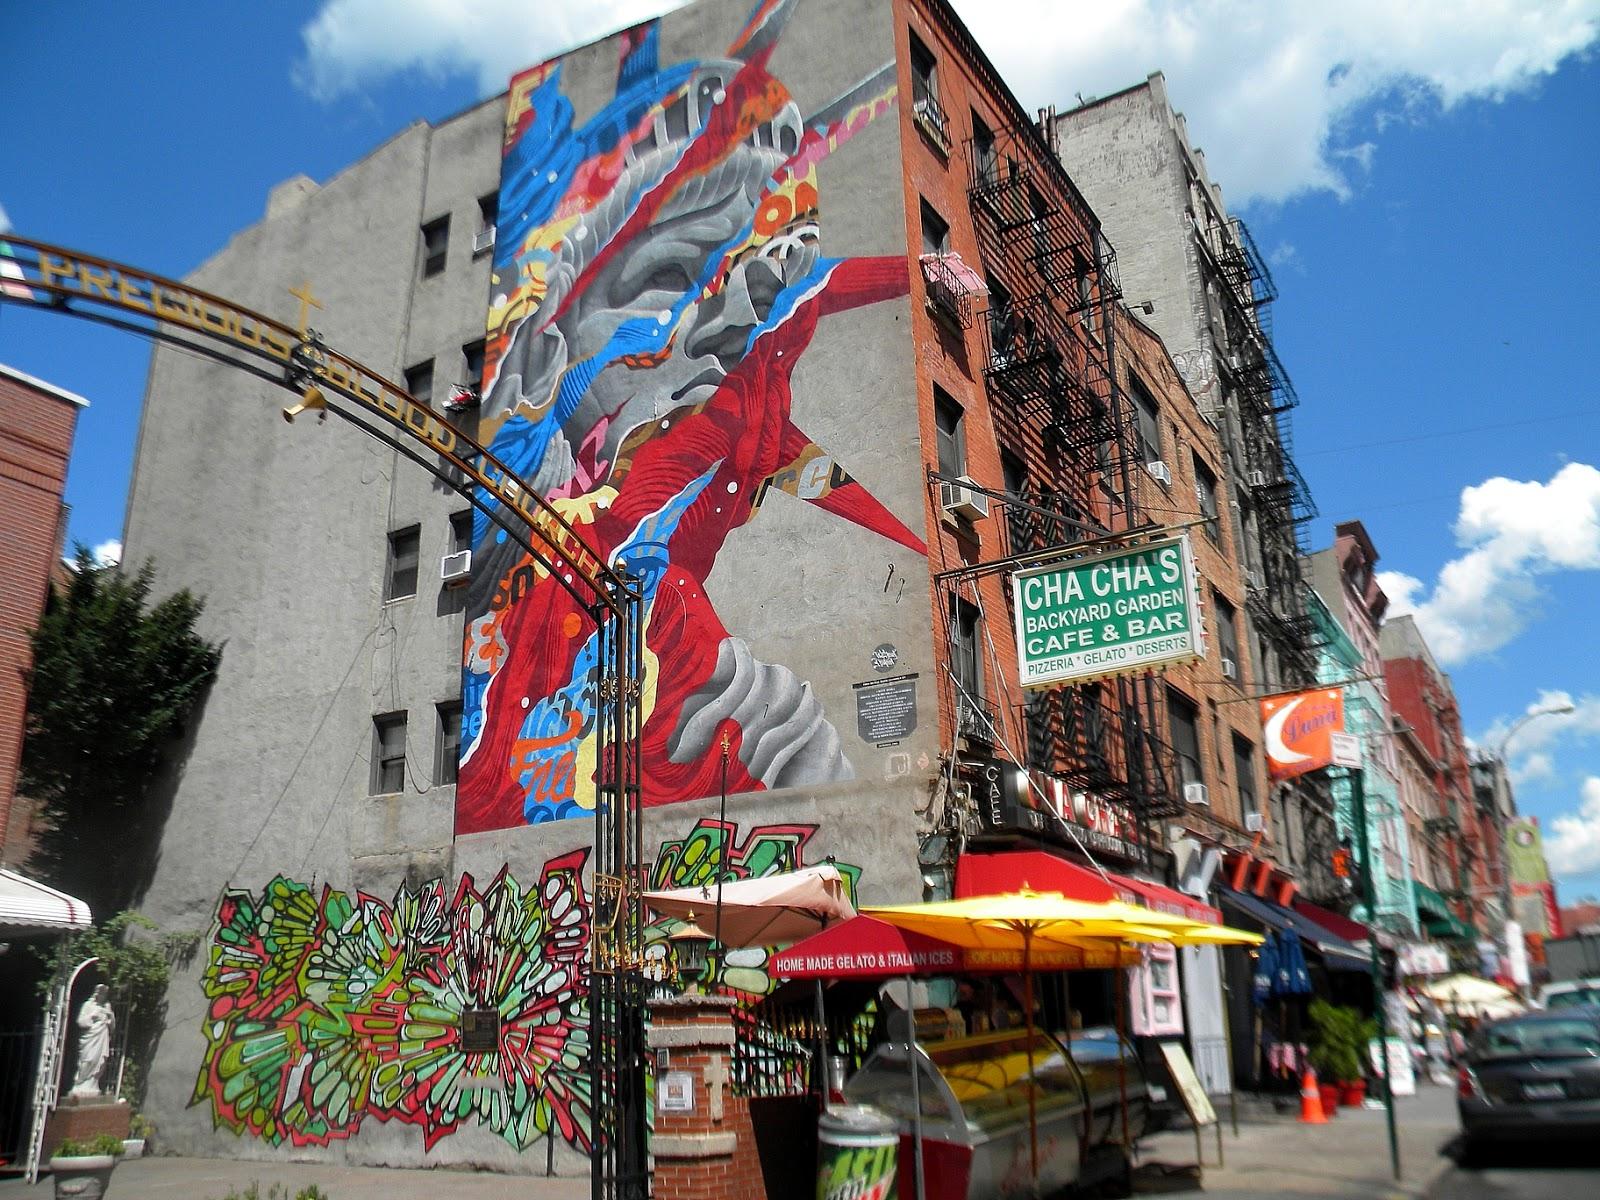 Graffiti street art photos public domain clip art photos for Mural festival